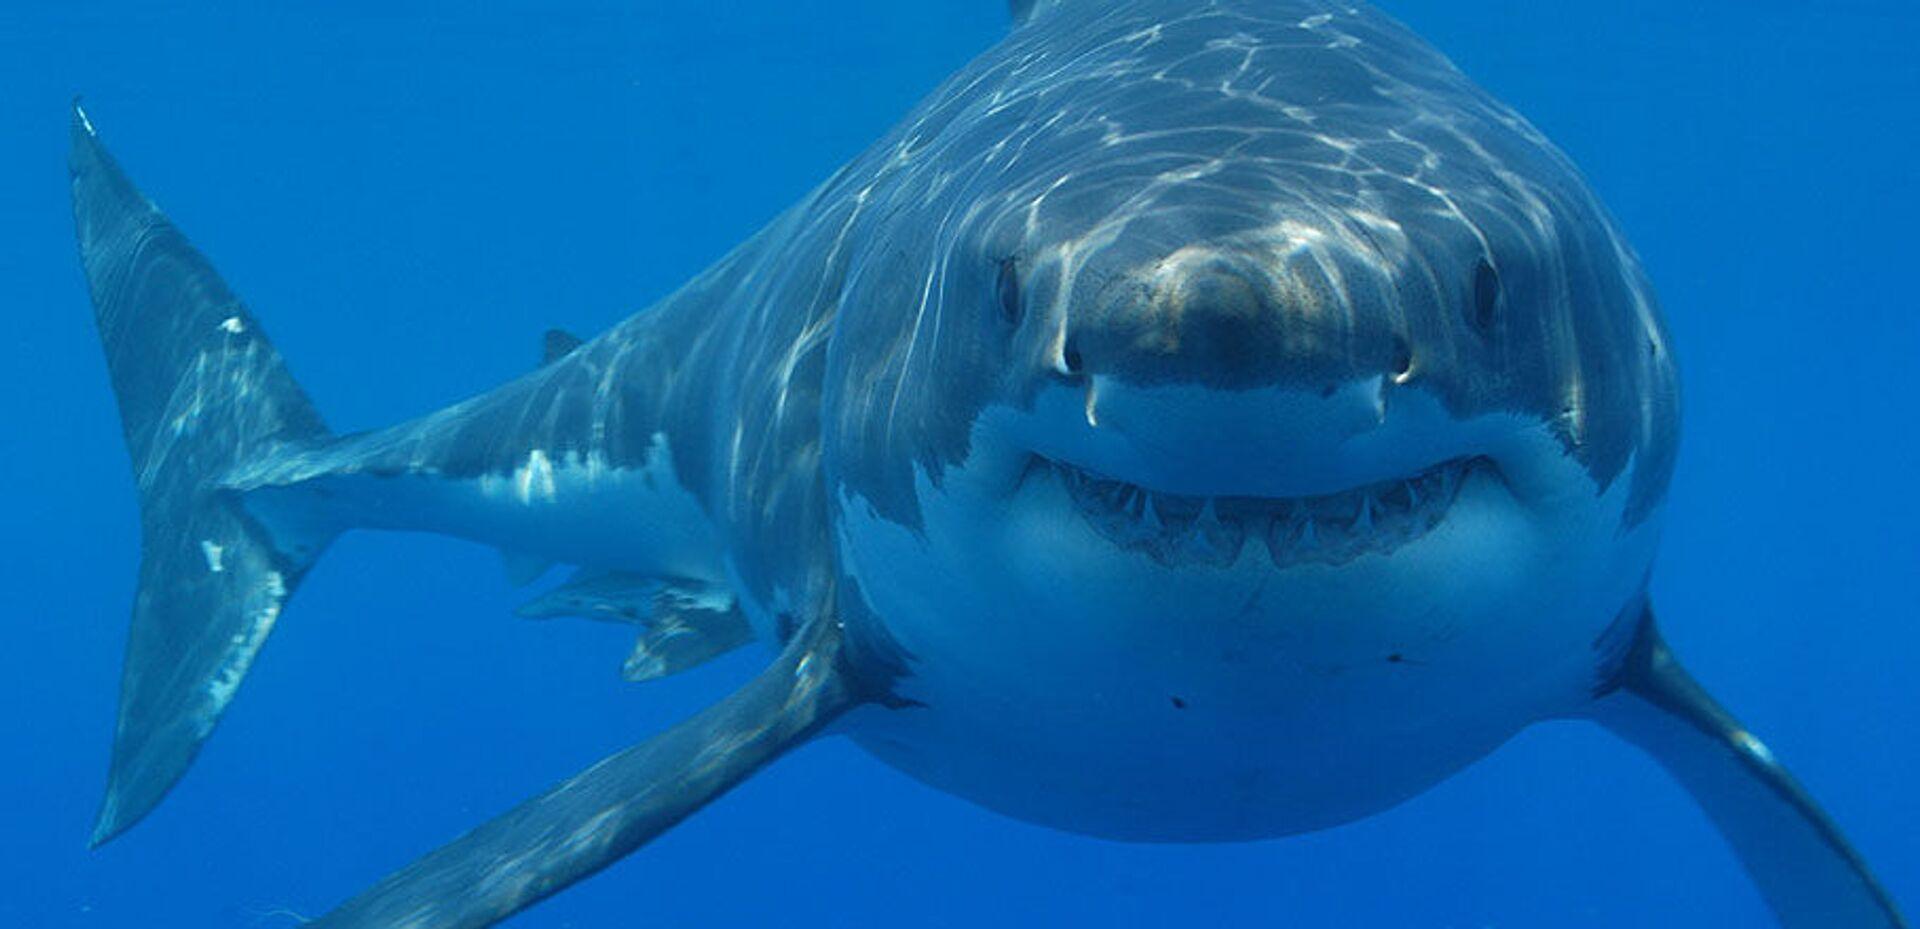 Great white shark - Sputnik International, 1920, 23.07.2021